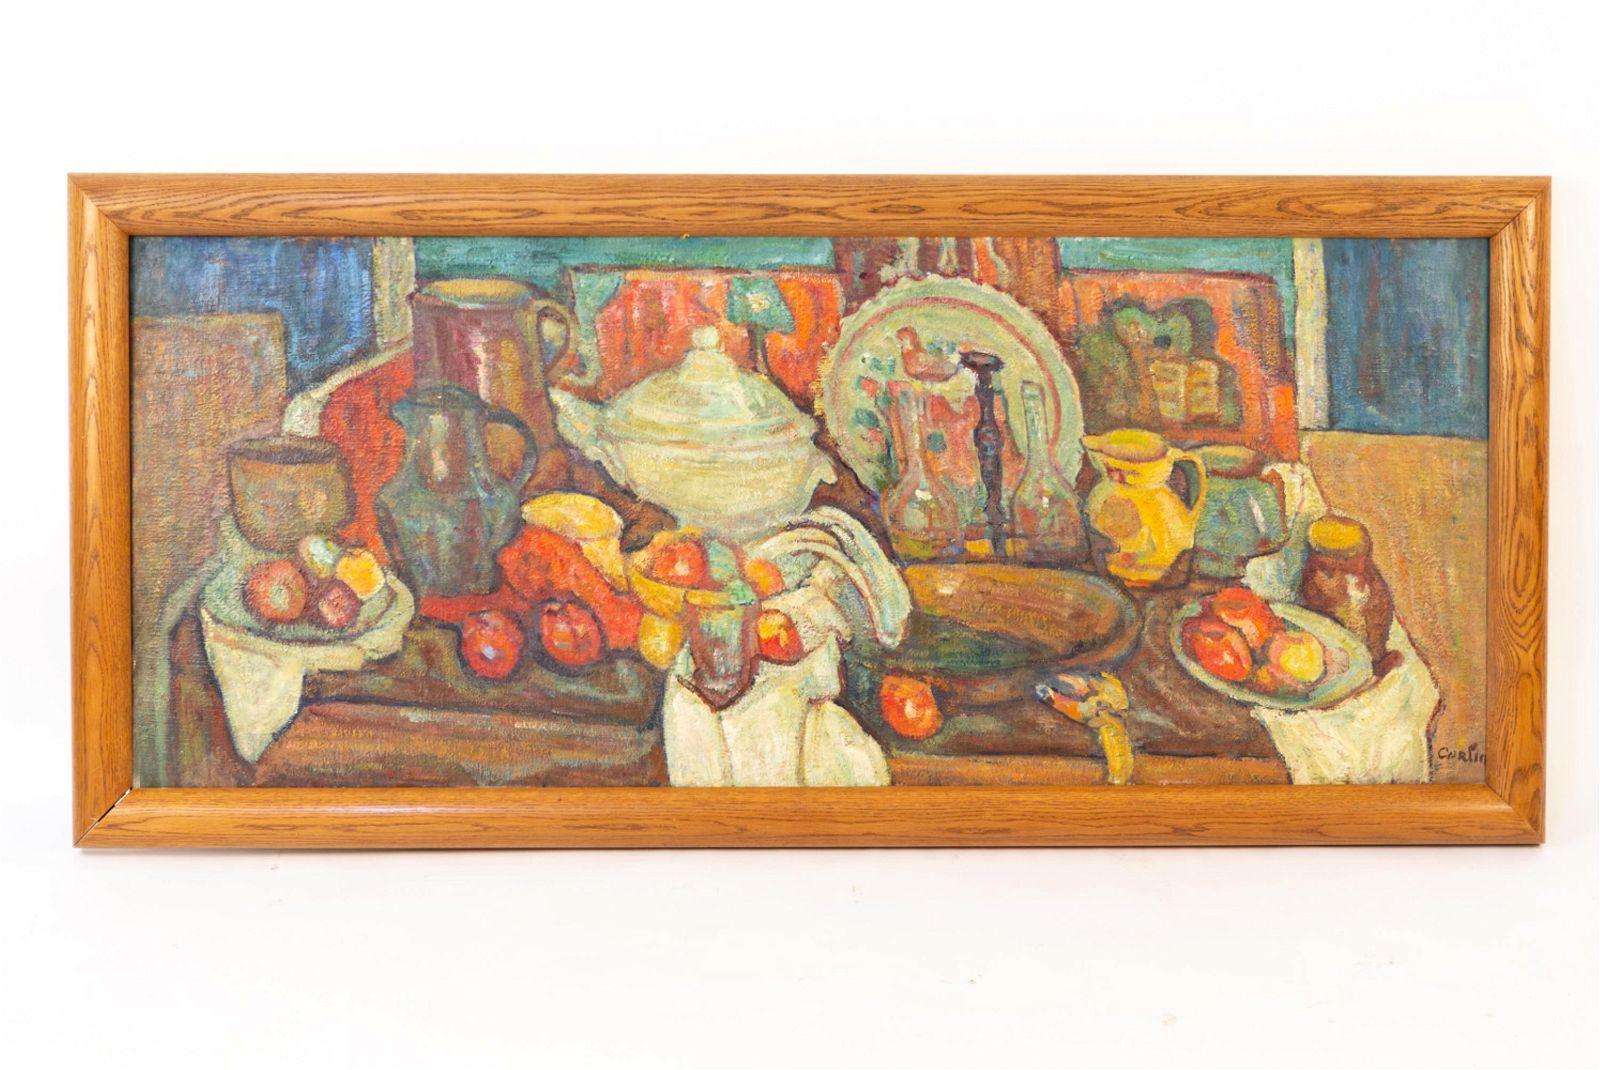 GUSTAVE CORLIN (FRENCH 1875-1969) STILL LIFE O/C